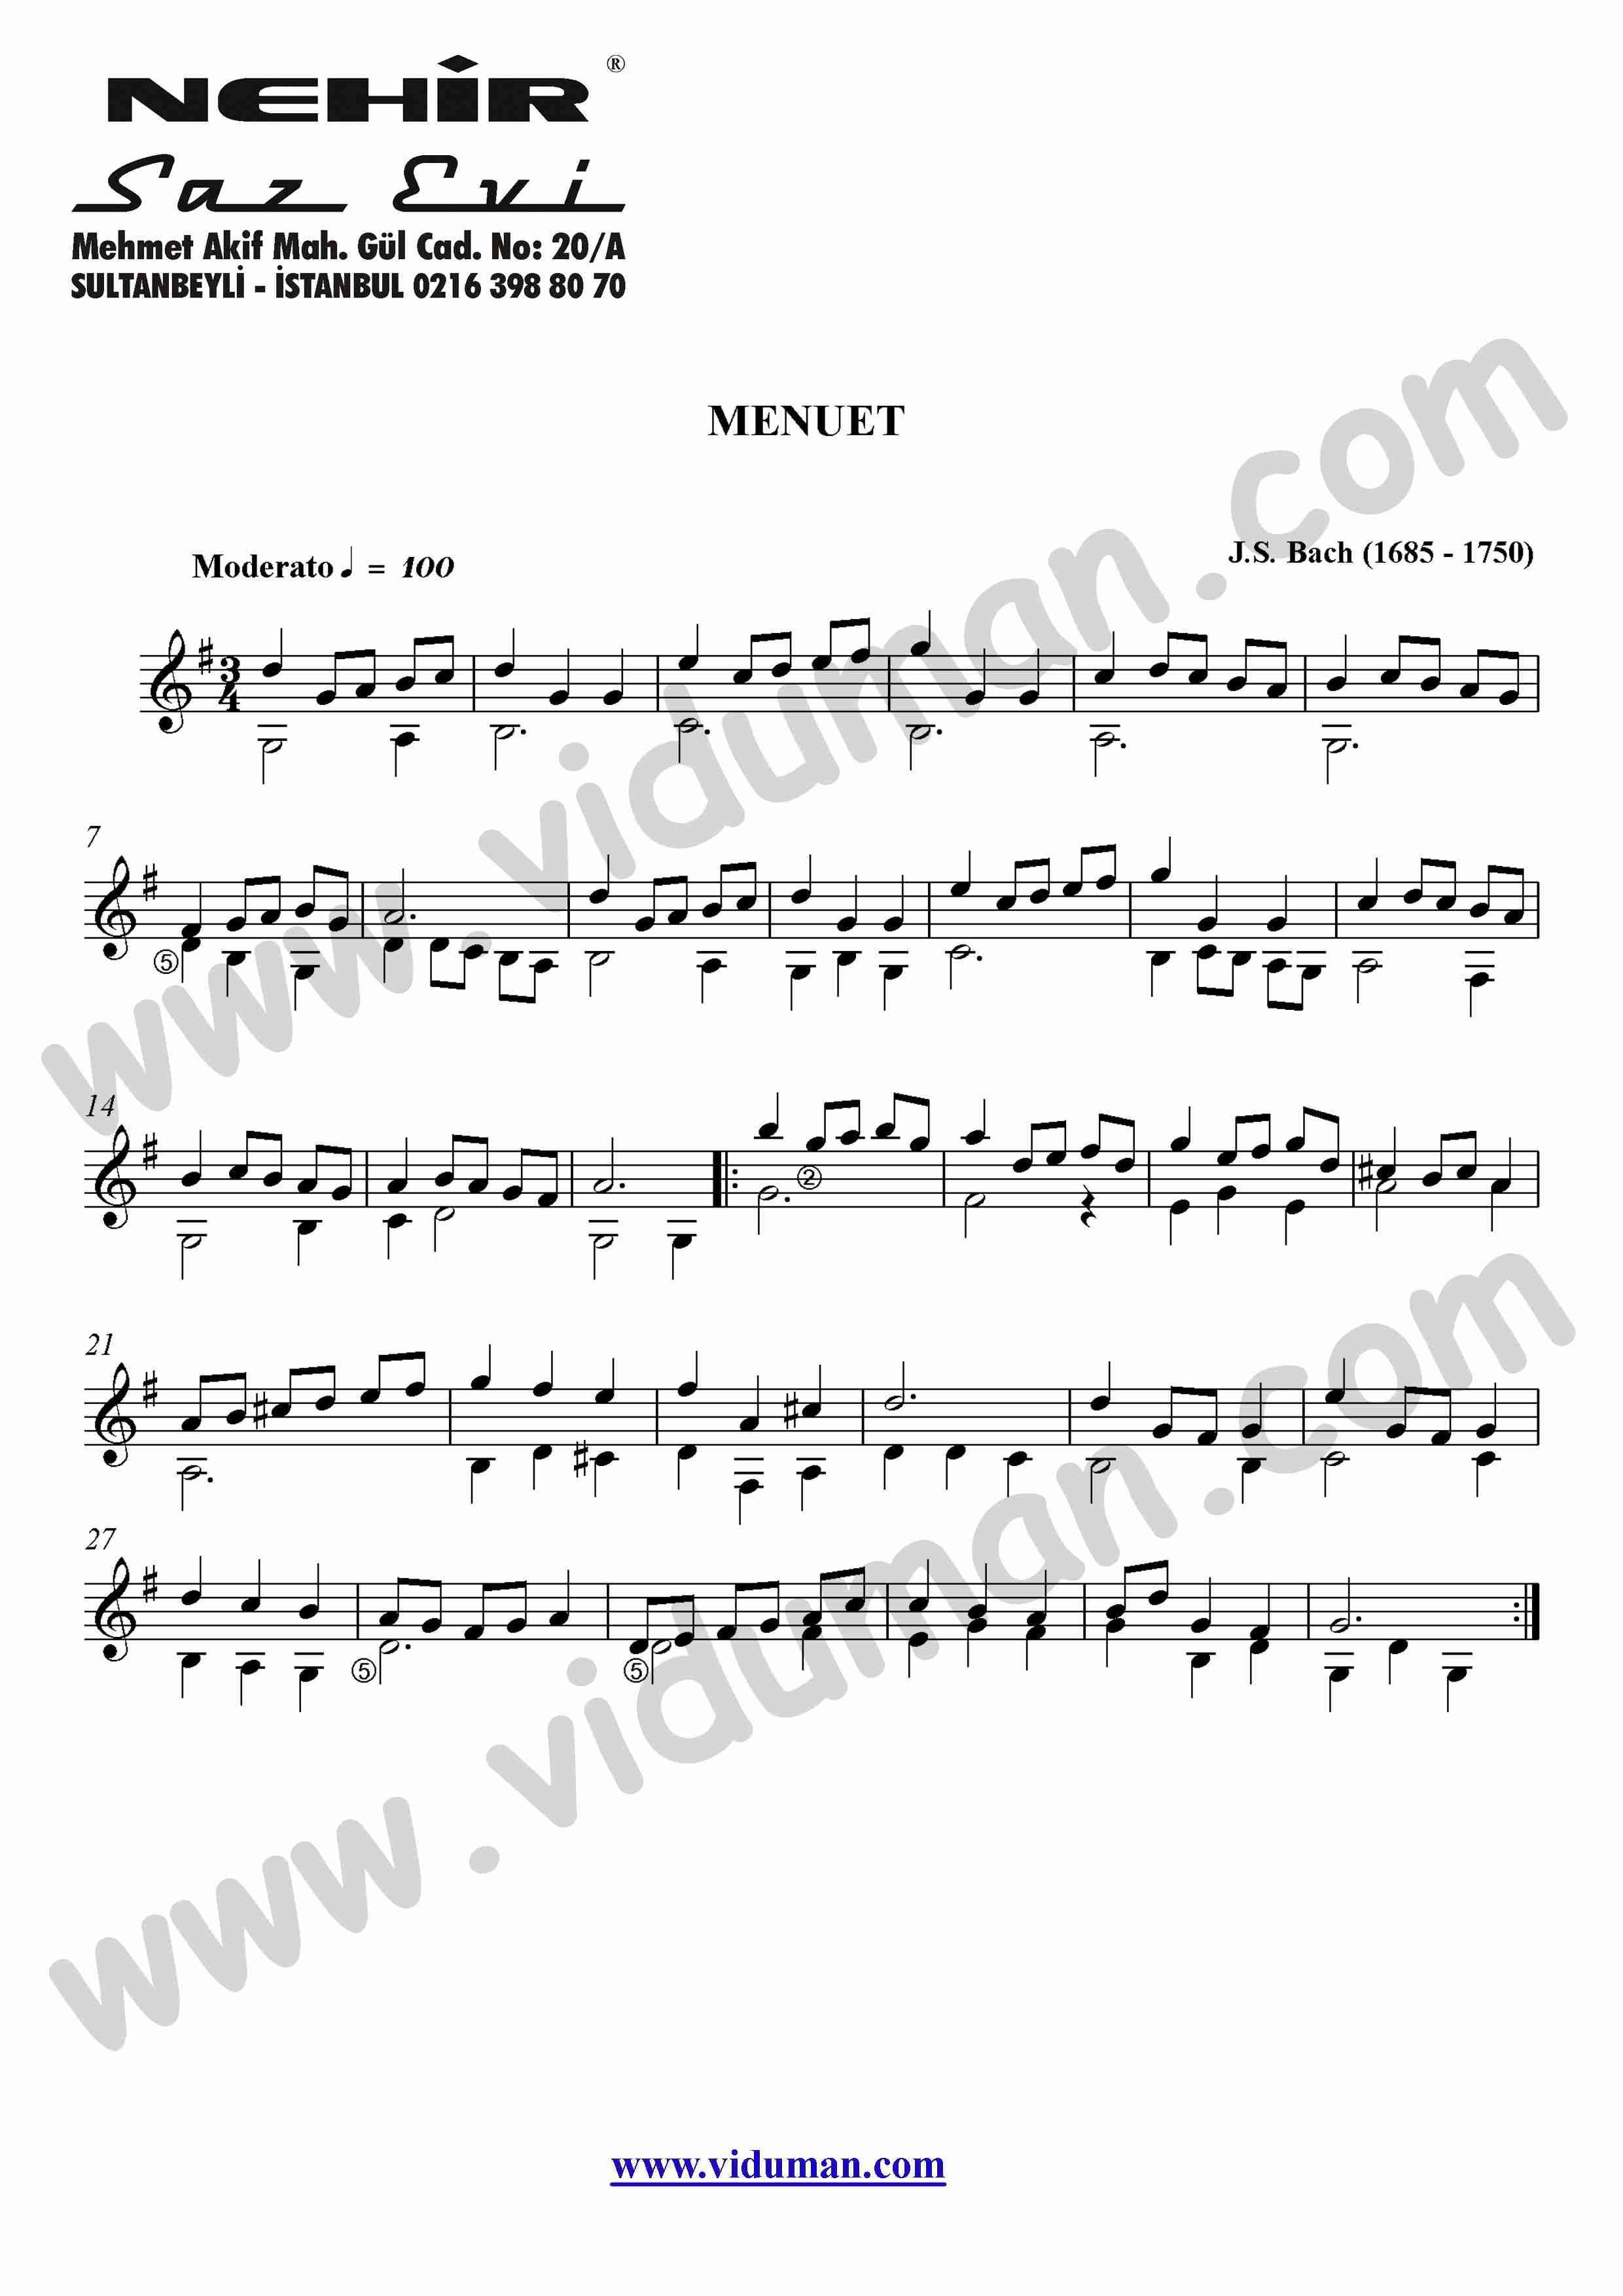 32- Menuet (J.S. Bach)